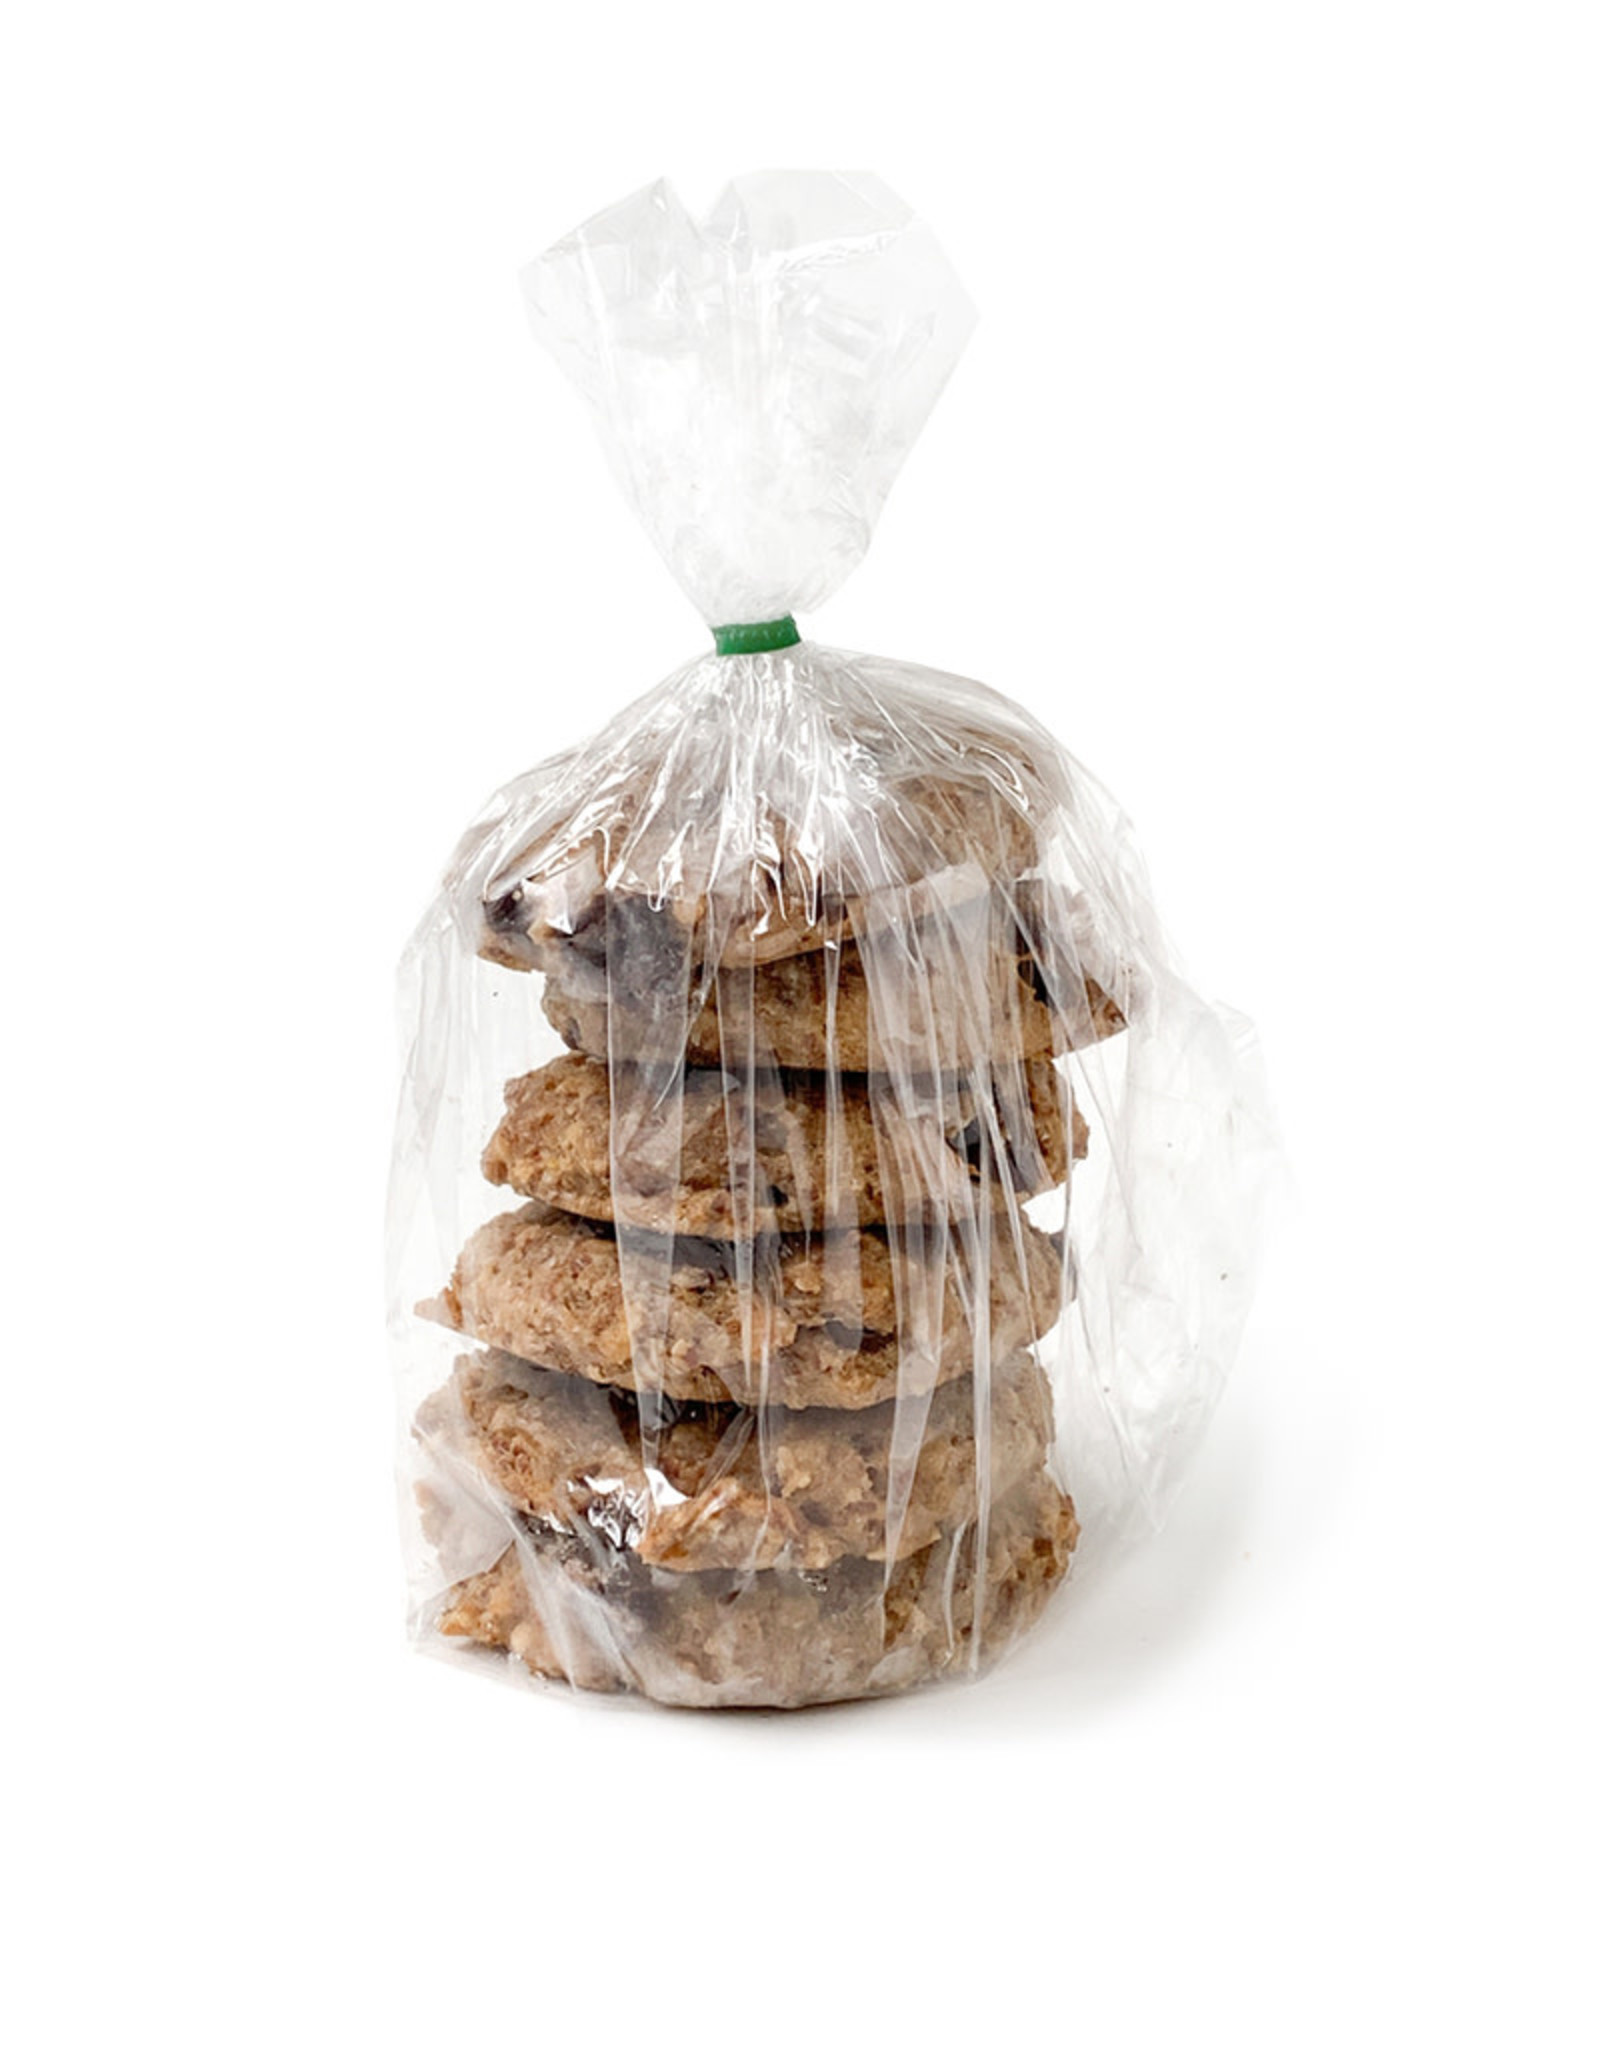 Nelas Kitchen Nelas Kitchen - Protein Cookies 6 pk